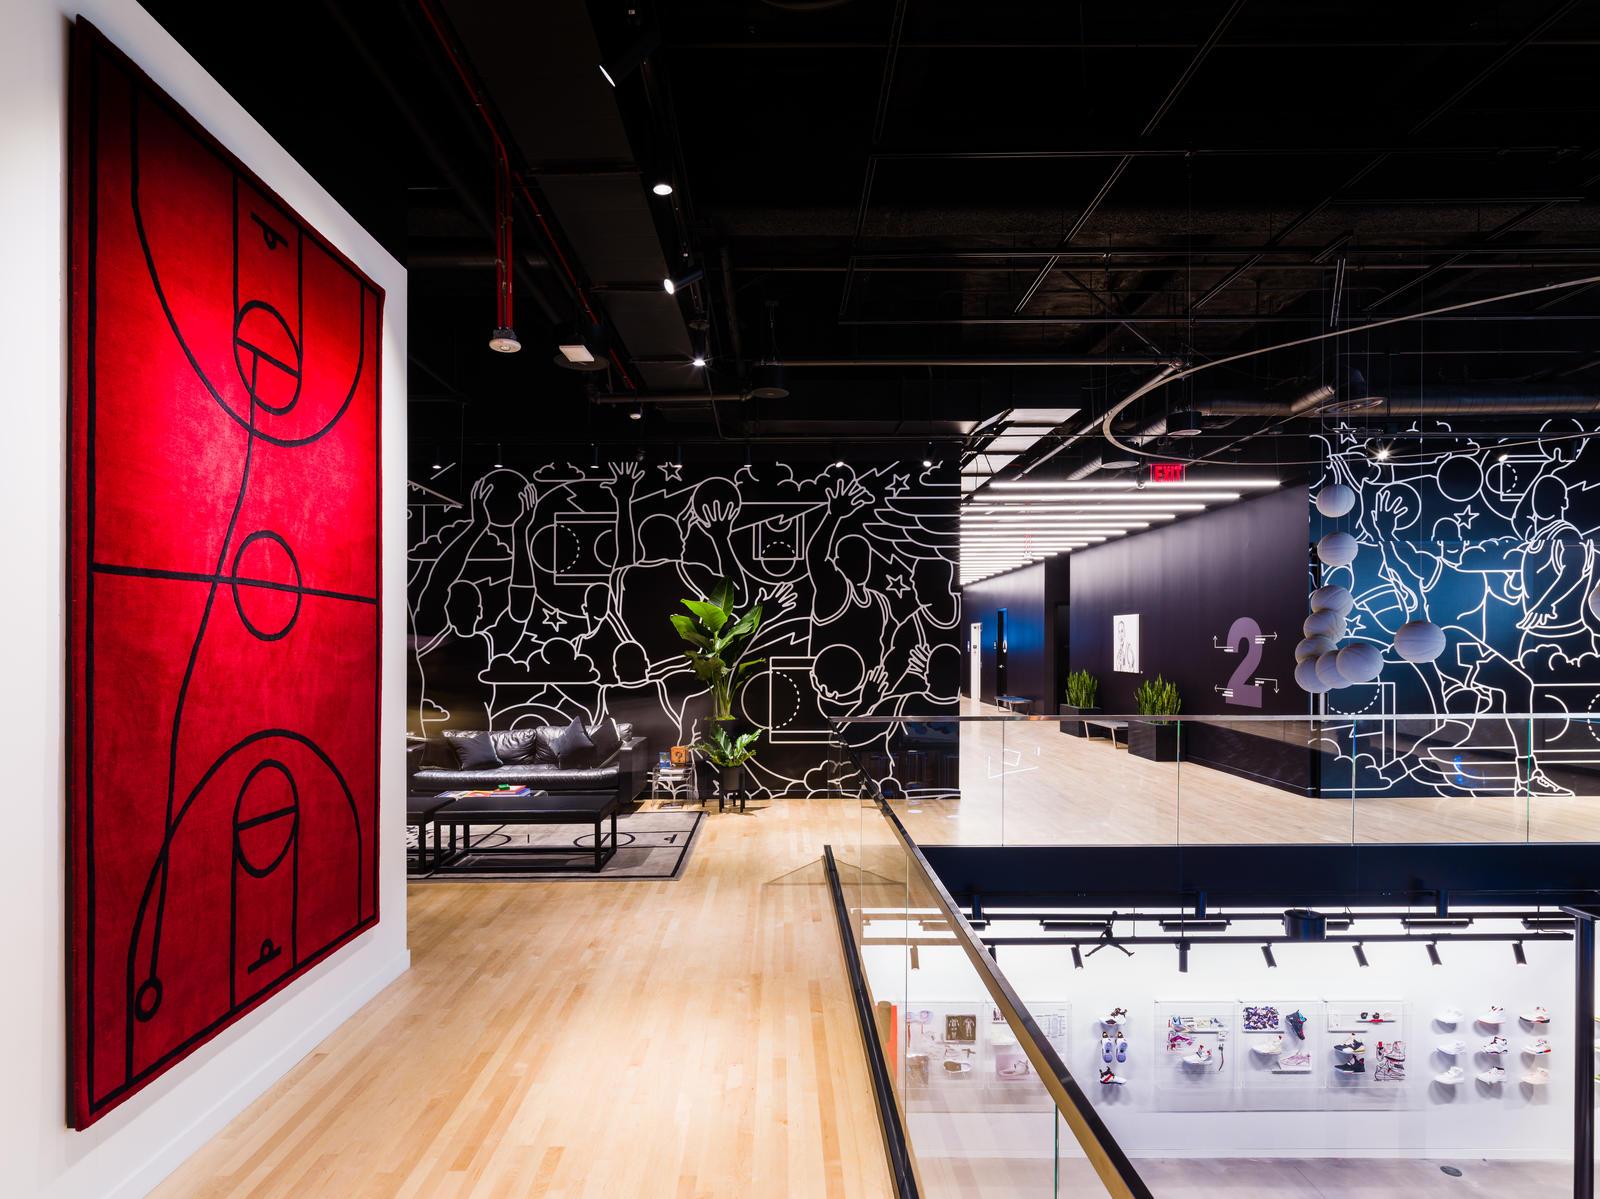 471a886d0790 Take a Look at the New Jordan Brand Jumpman LA Retail Store in ...